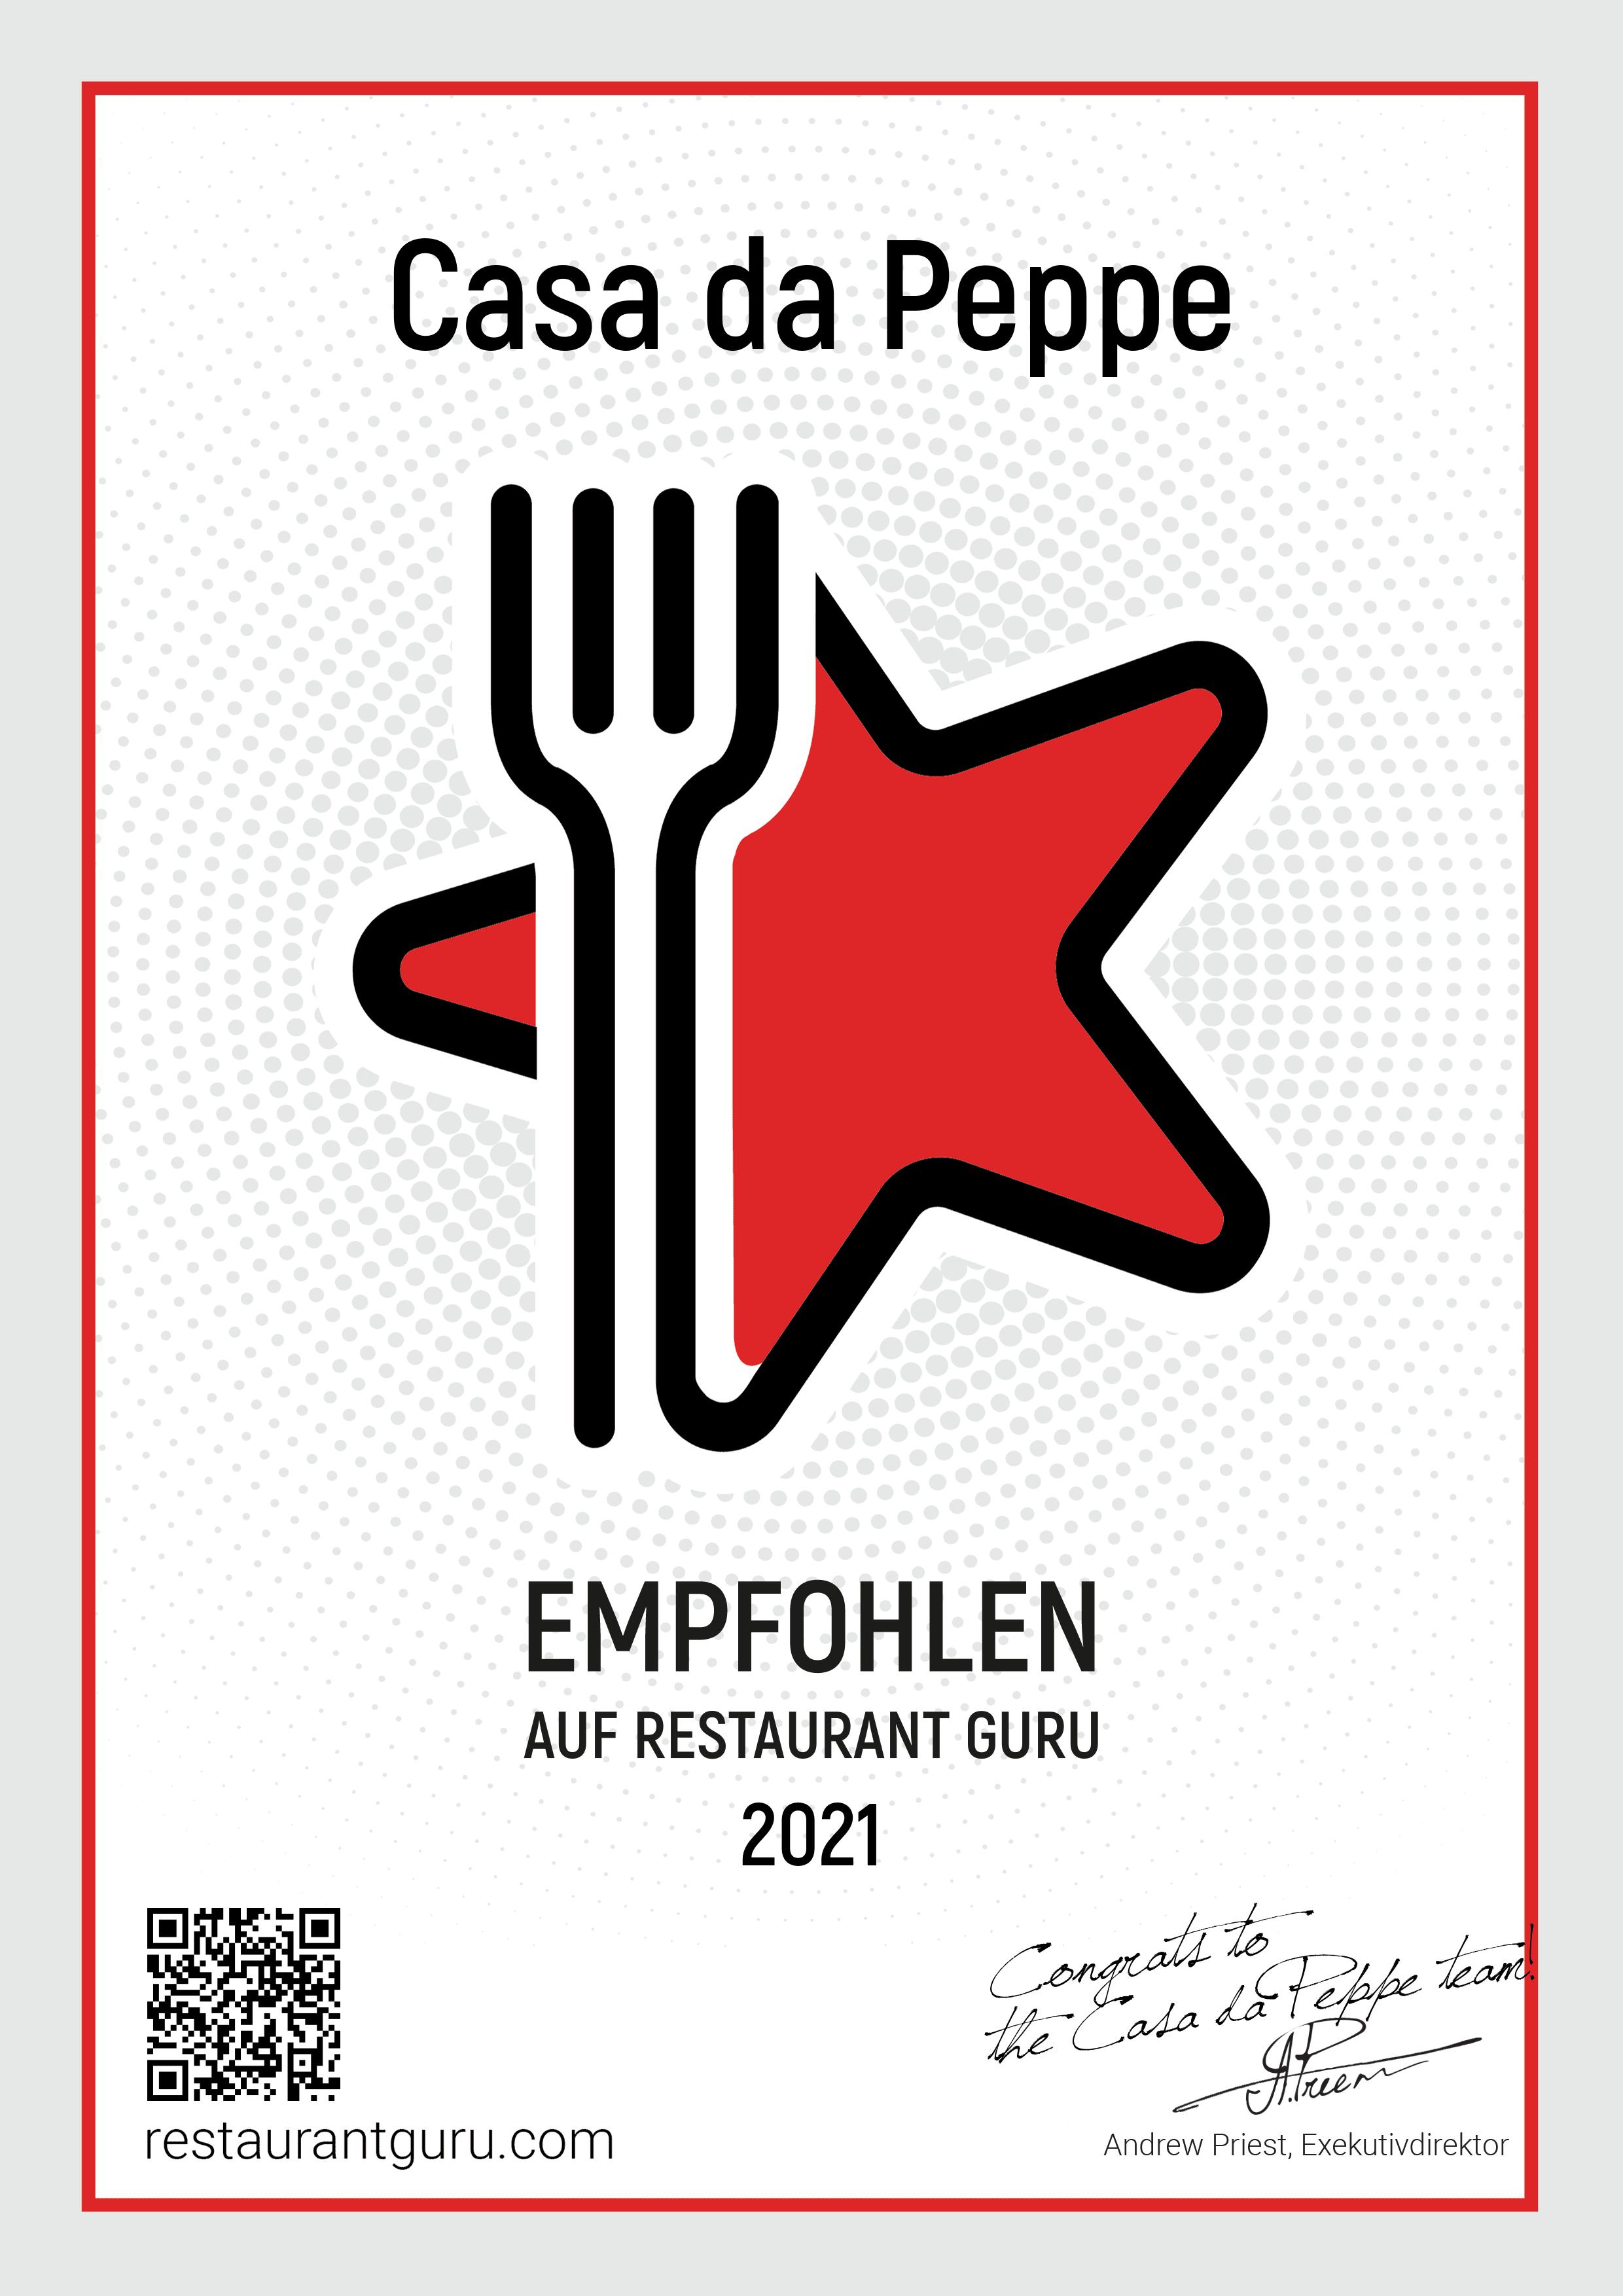 Restaurant Guru Empfehlung Casa da Pepe